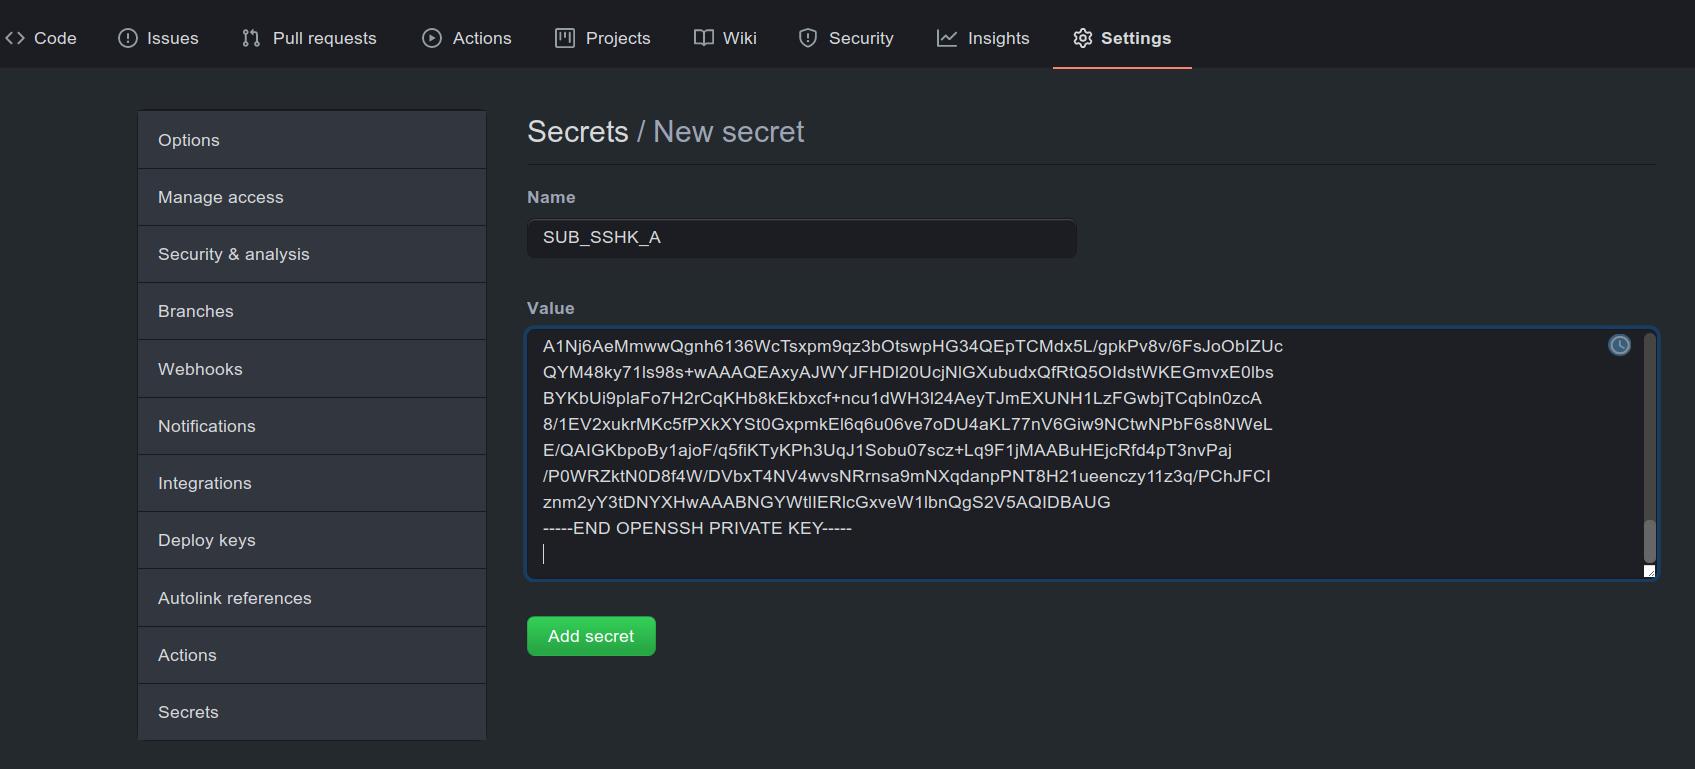 Figure 1: Secret setup in the private project